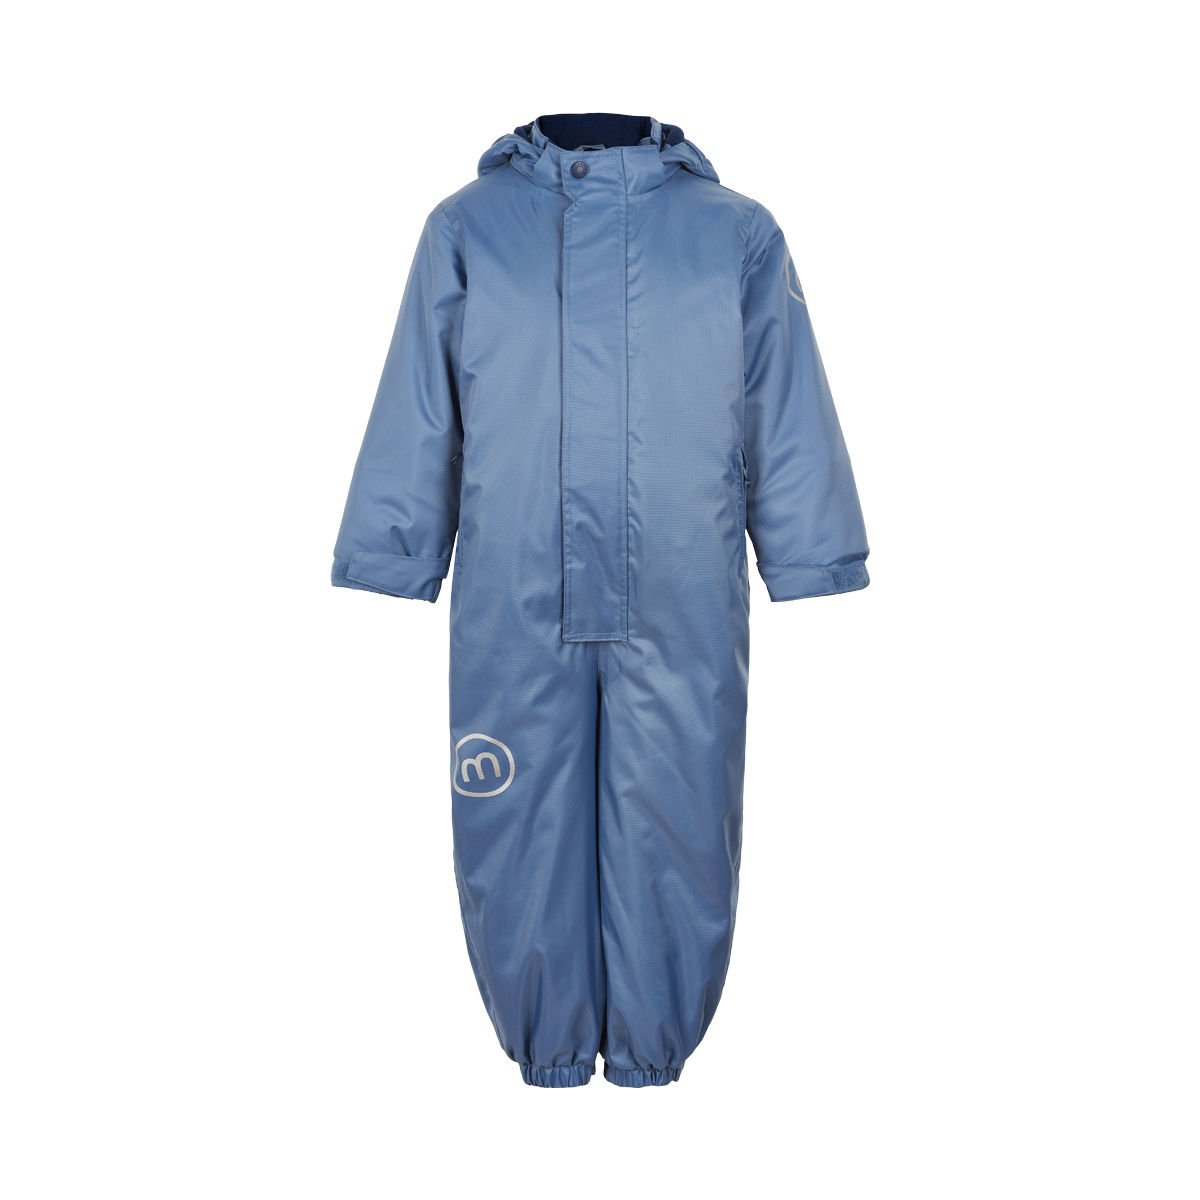 MINYMO Kinder Schneeanzug Schneeoverall Functionswear Wassersäule 8000 mm Atmungsaktiv Winddicht Getapte Nähte